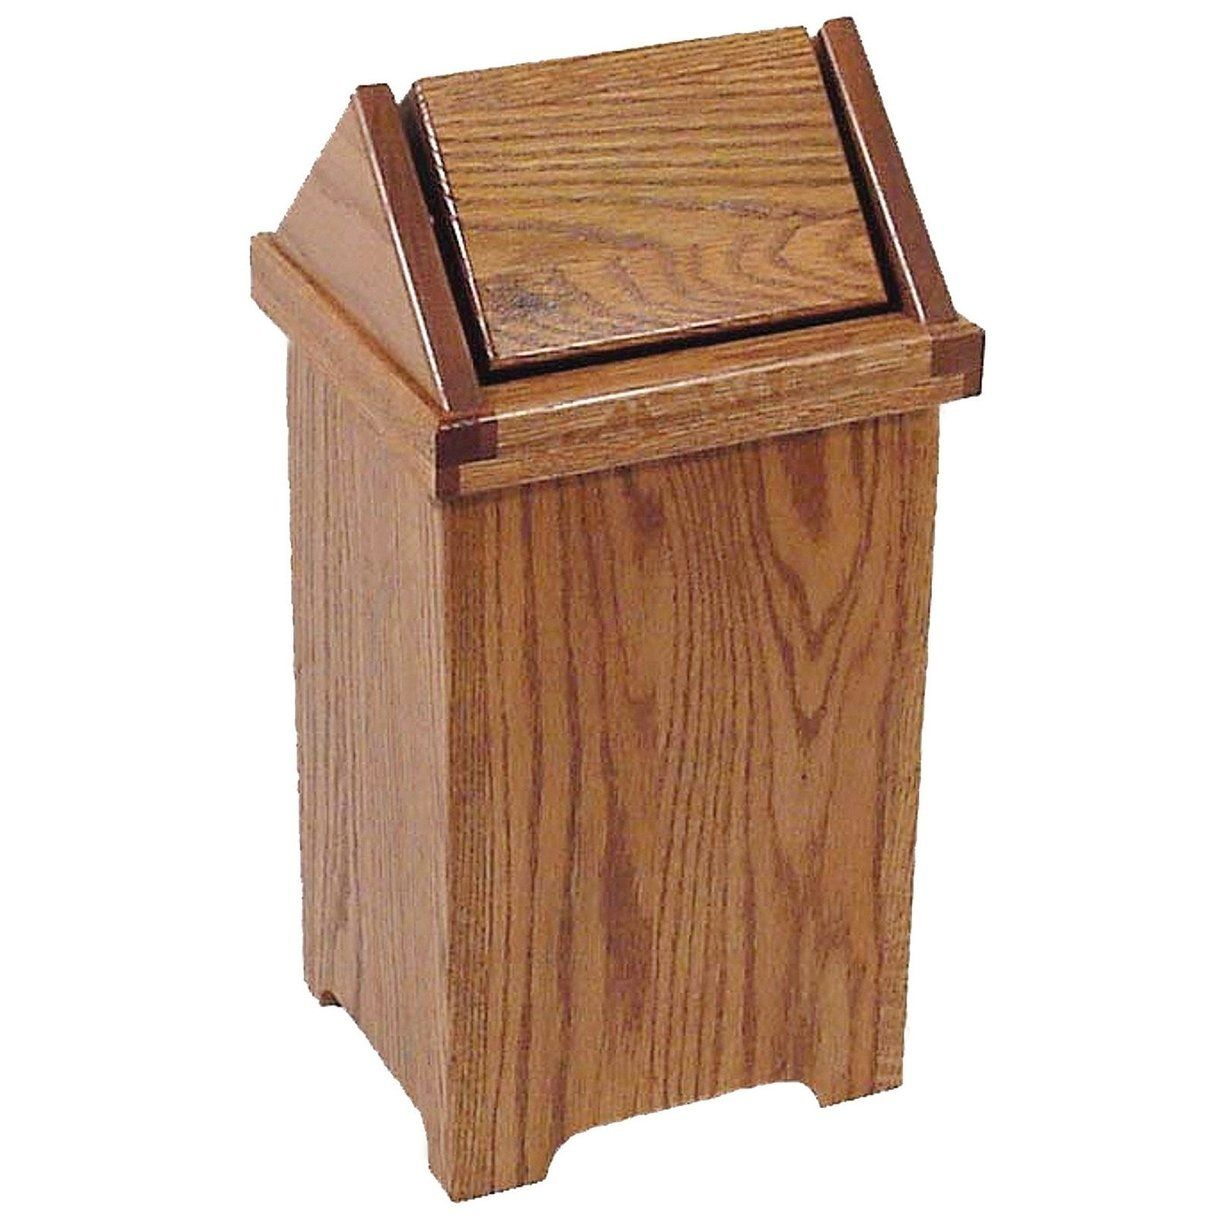 Oak Flip Top Trash Recycling Bin 12 W X 12 D X 19 H 12 16 Gallon Recycler Swing Lid Brown 12 W X 12 D Wood Trash Can Wooden Trash Can Kitchen Trash Cans